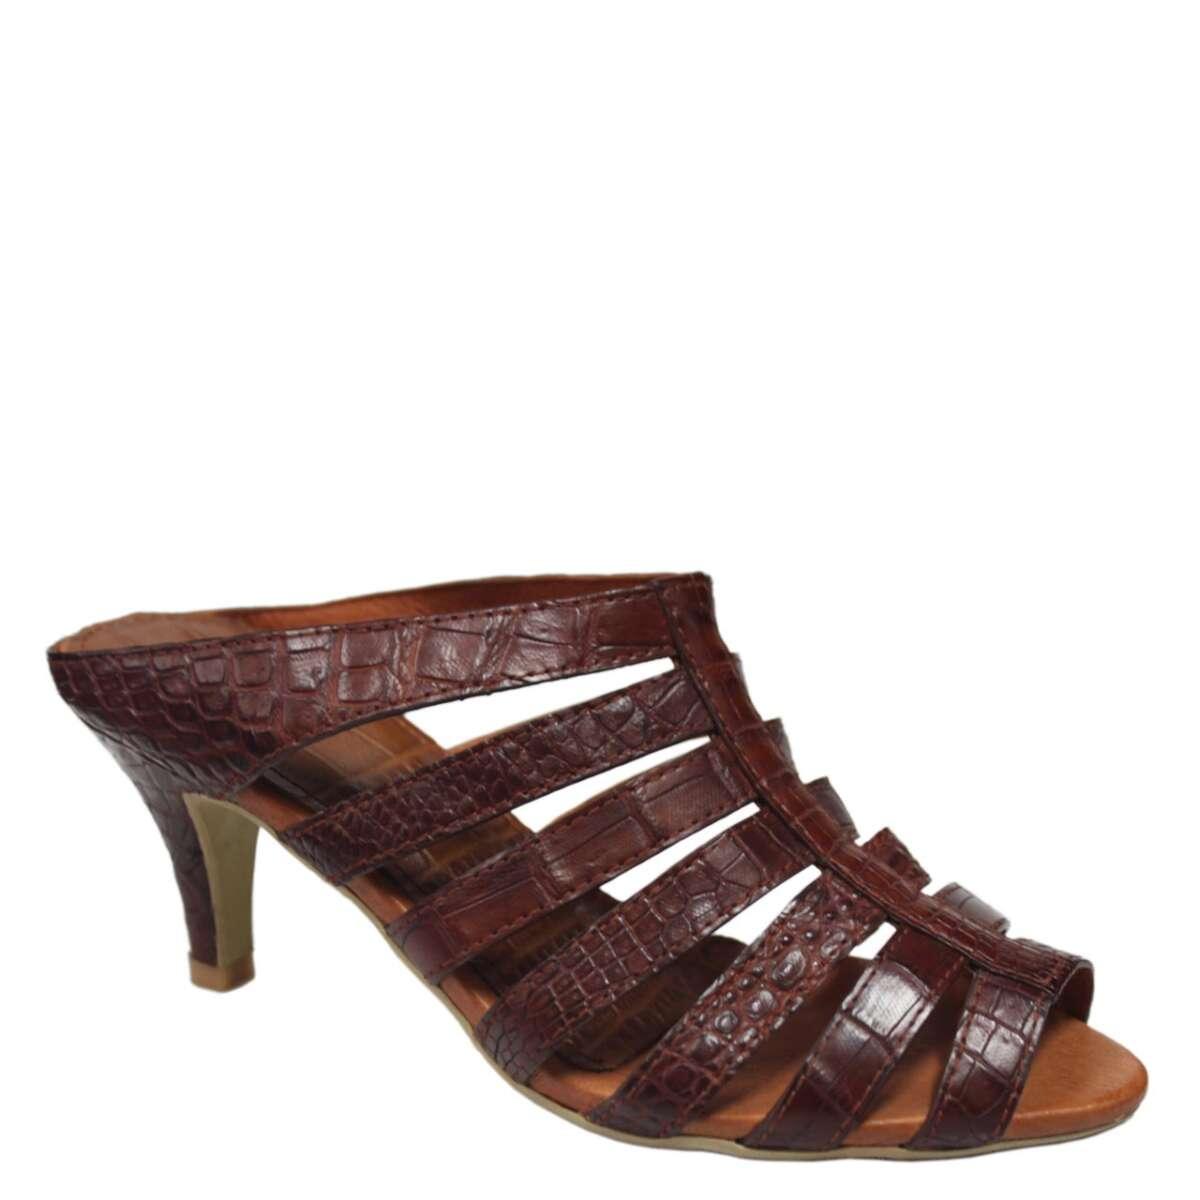 Crocodile leather high heels S791a